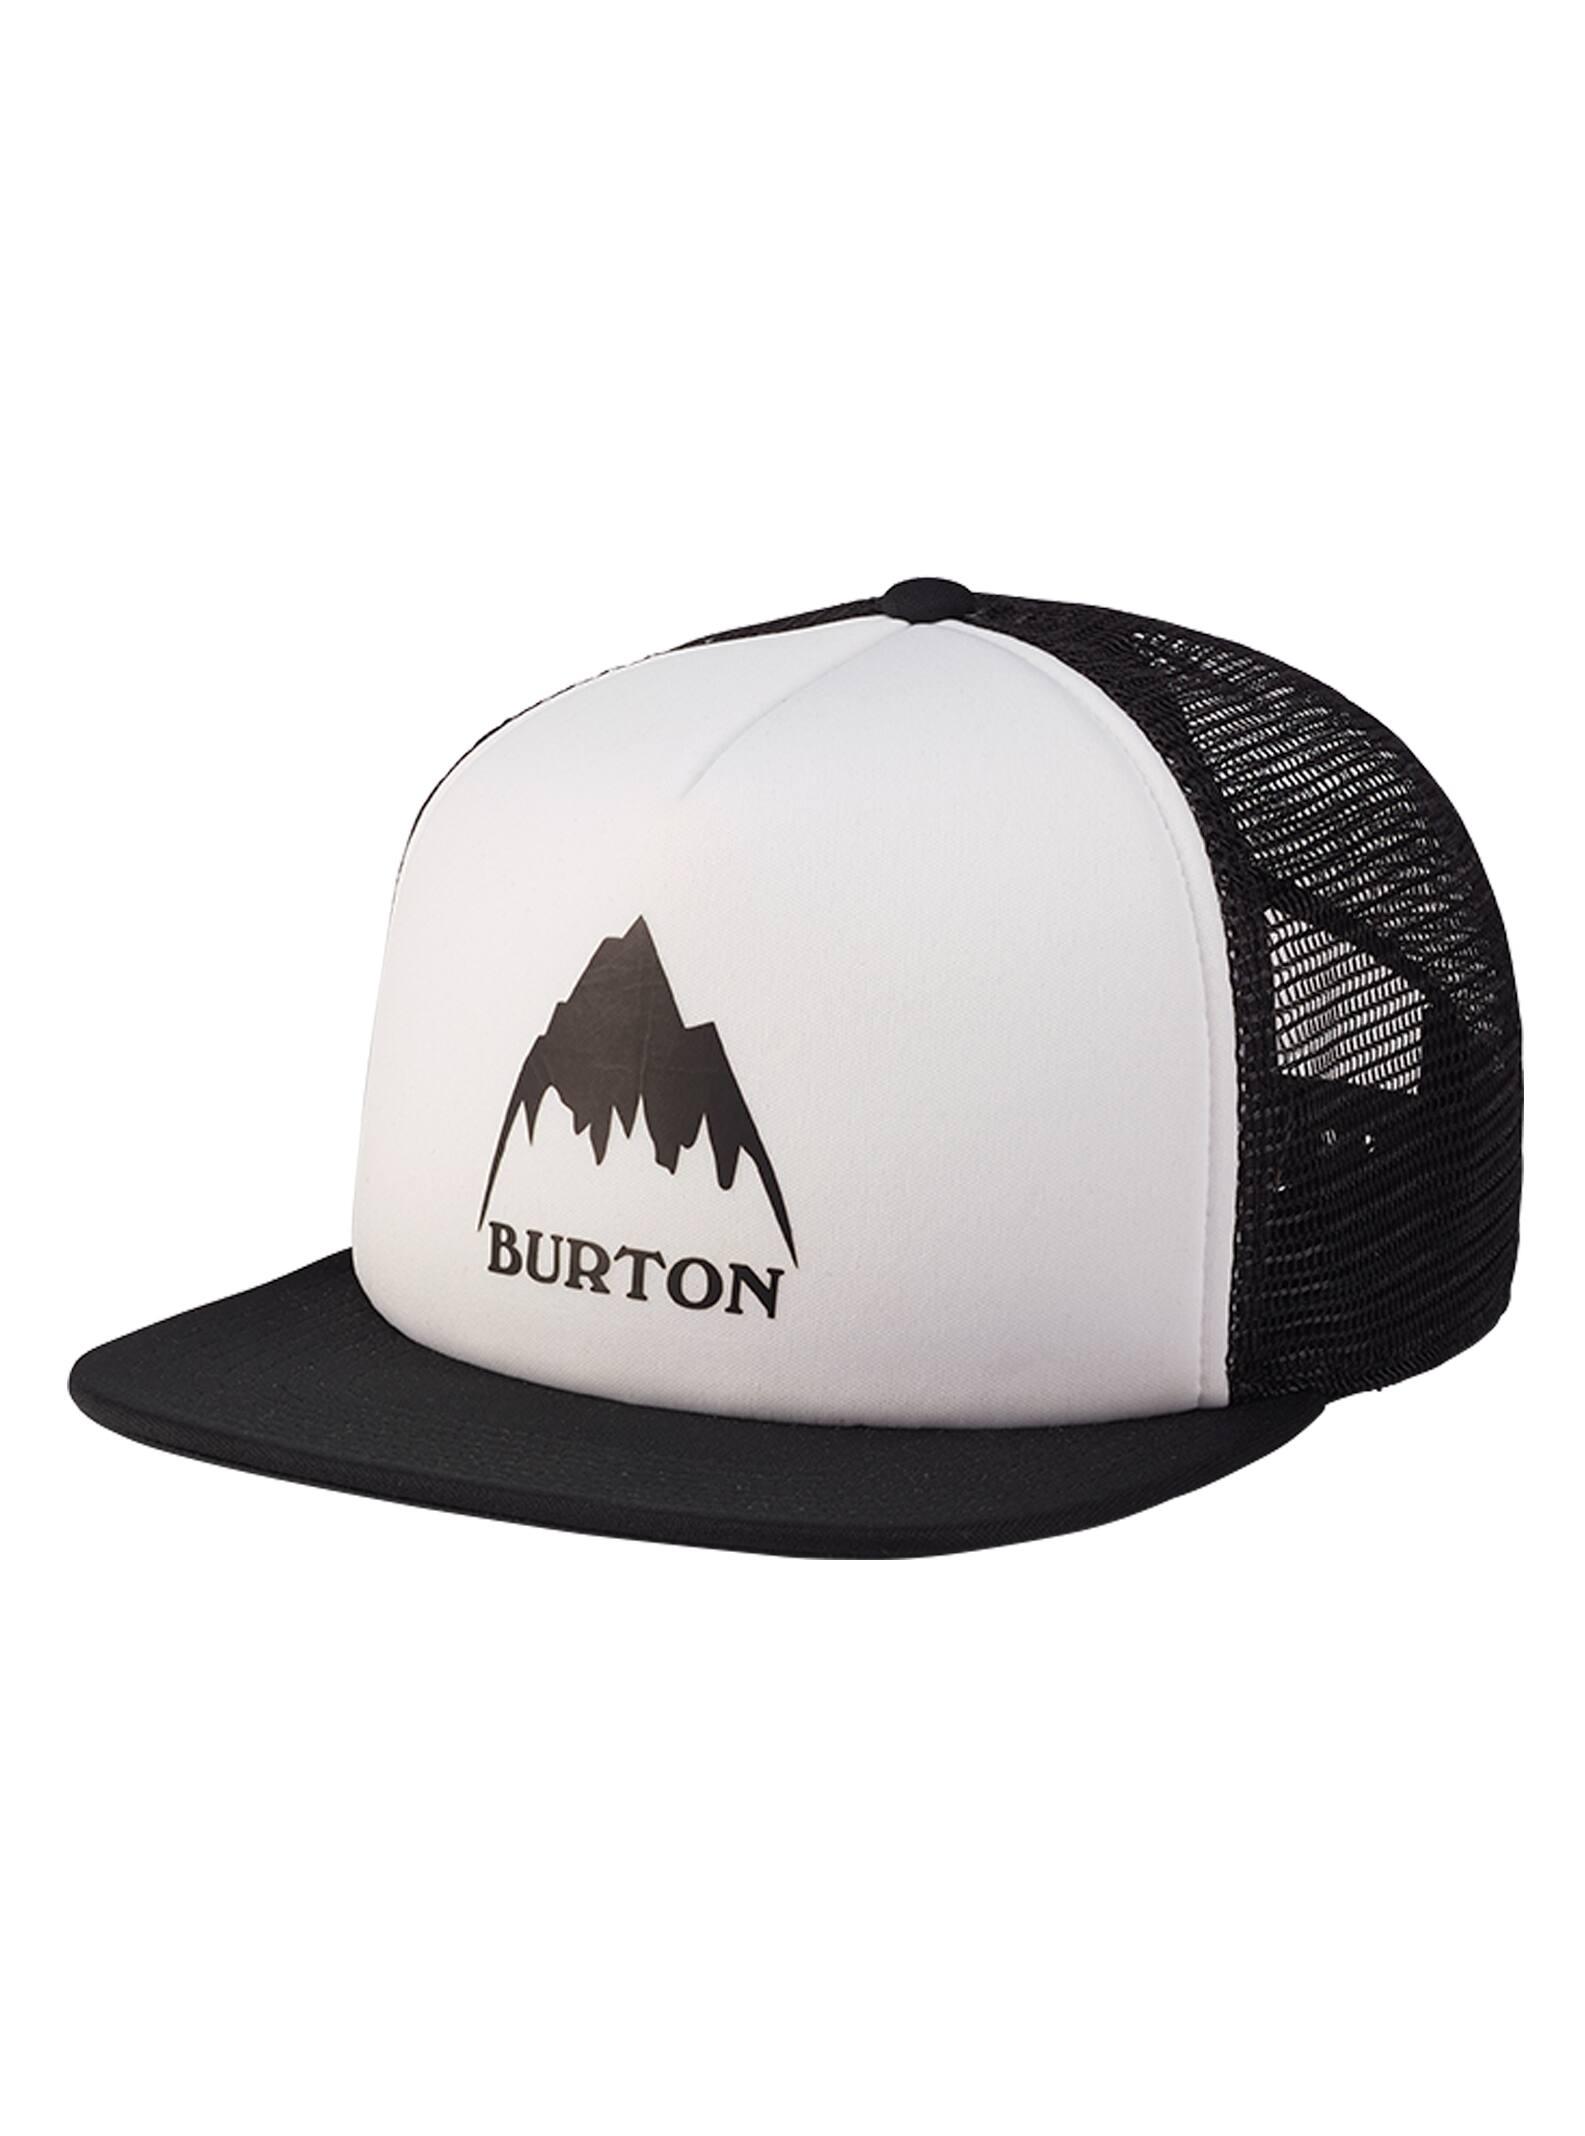 Burton Hommes Casquette SMN kactusbunch BN